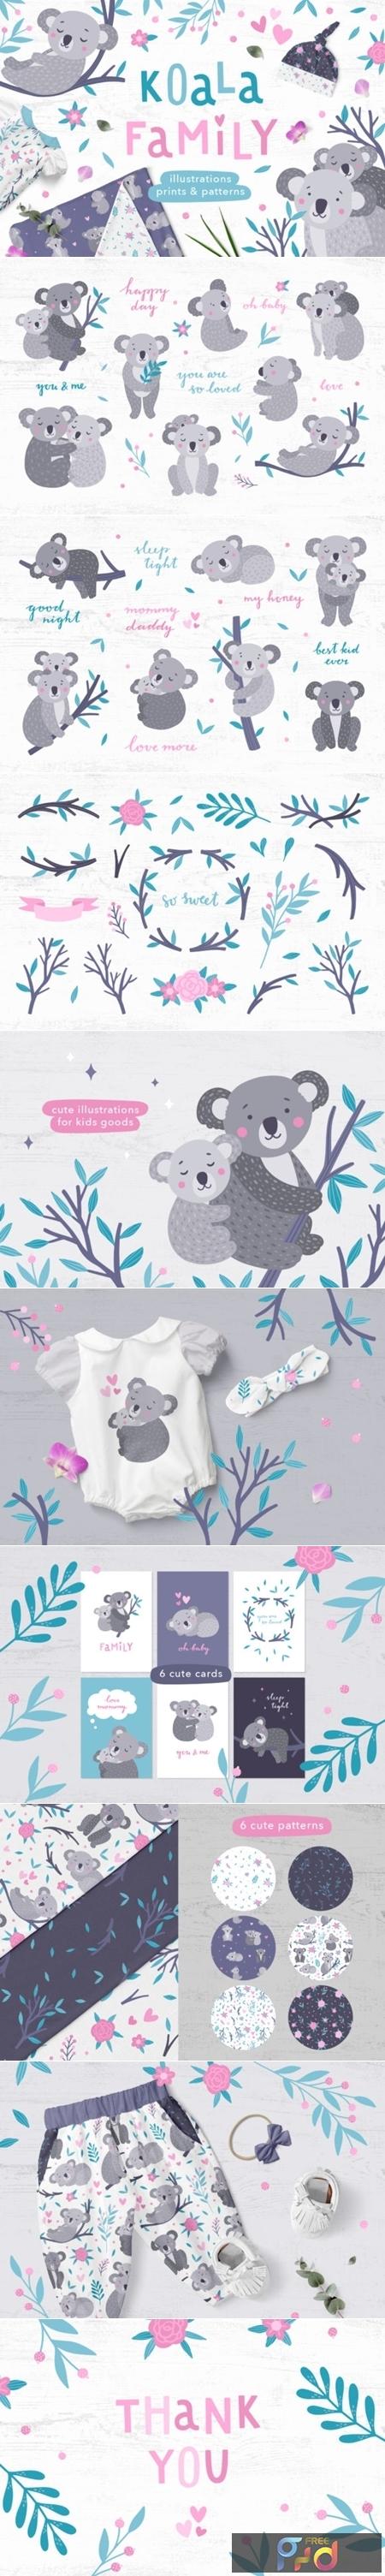 Koala Family Illustrations 1508118 1